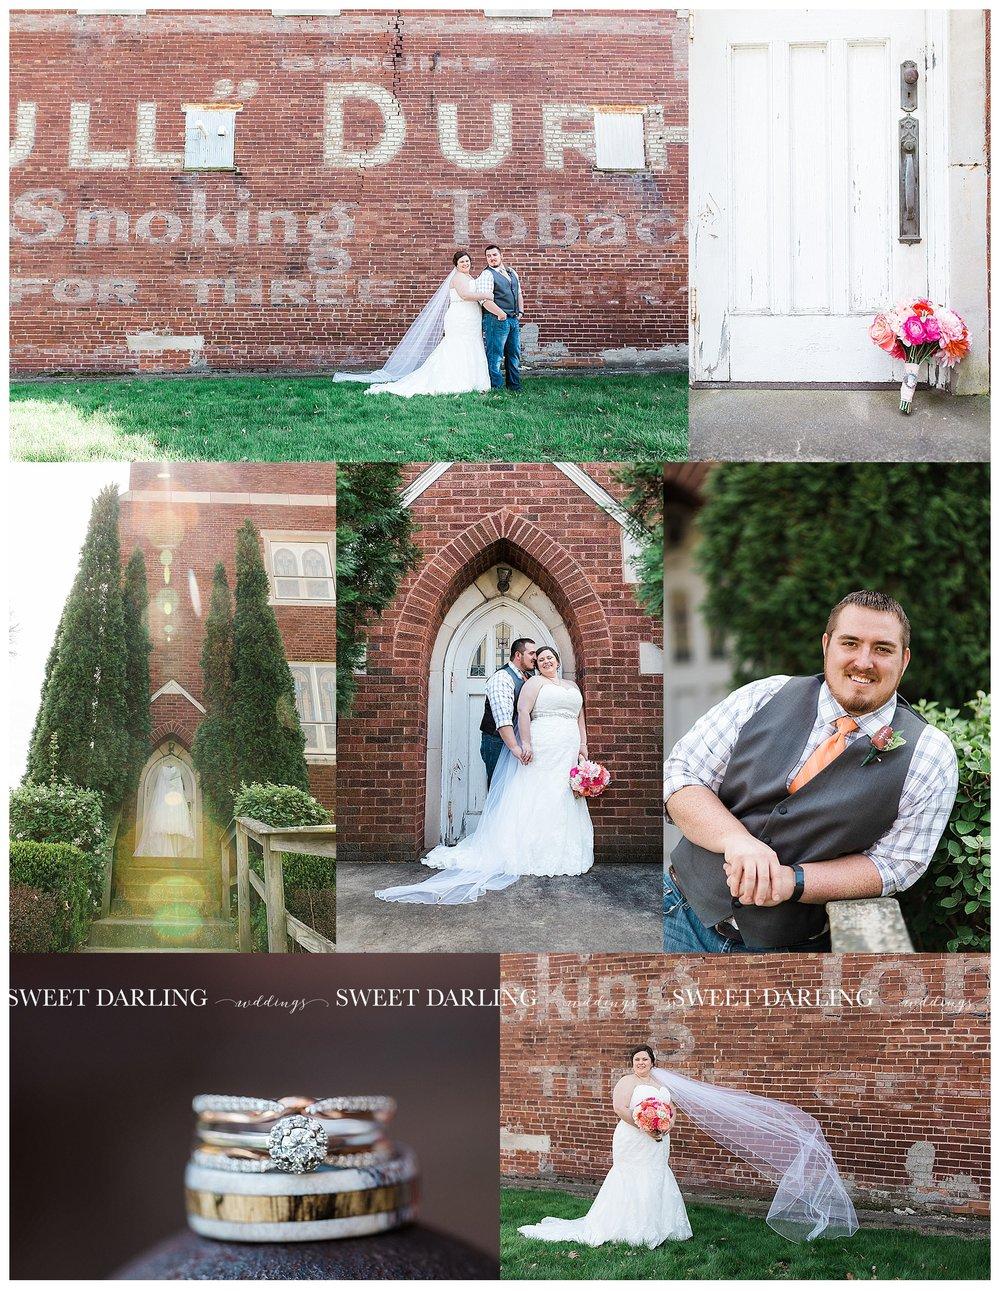 arcoloa-illinois-coles-county-wedding-photography-sweet-darling-weddings-photographer_0938.jpg